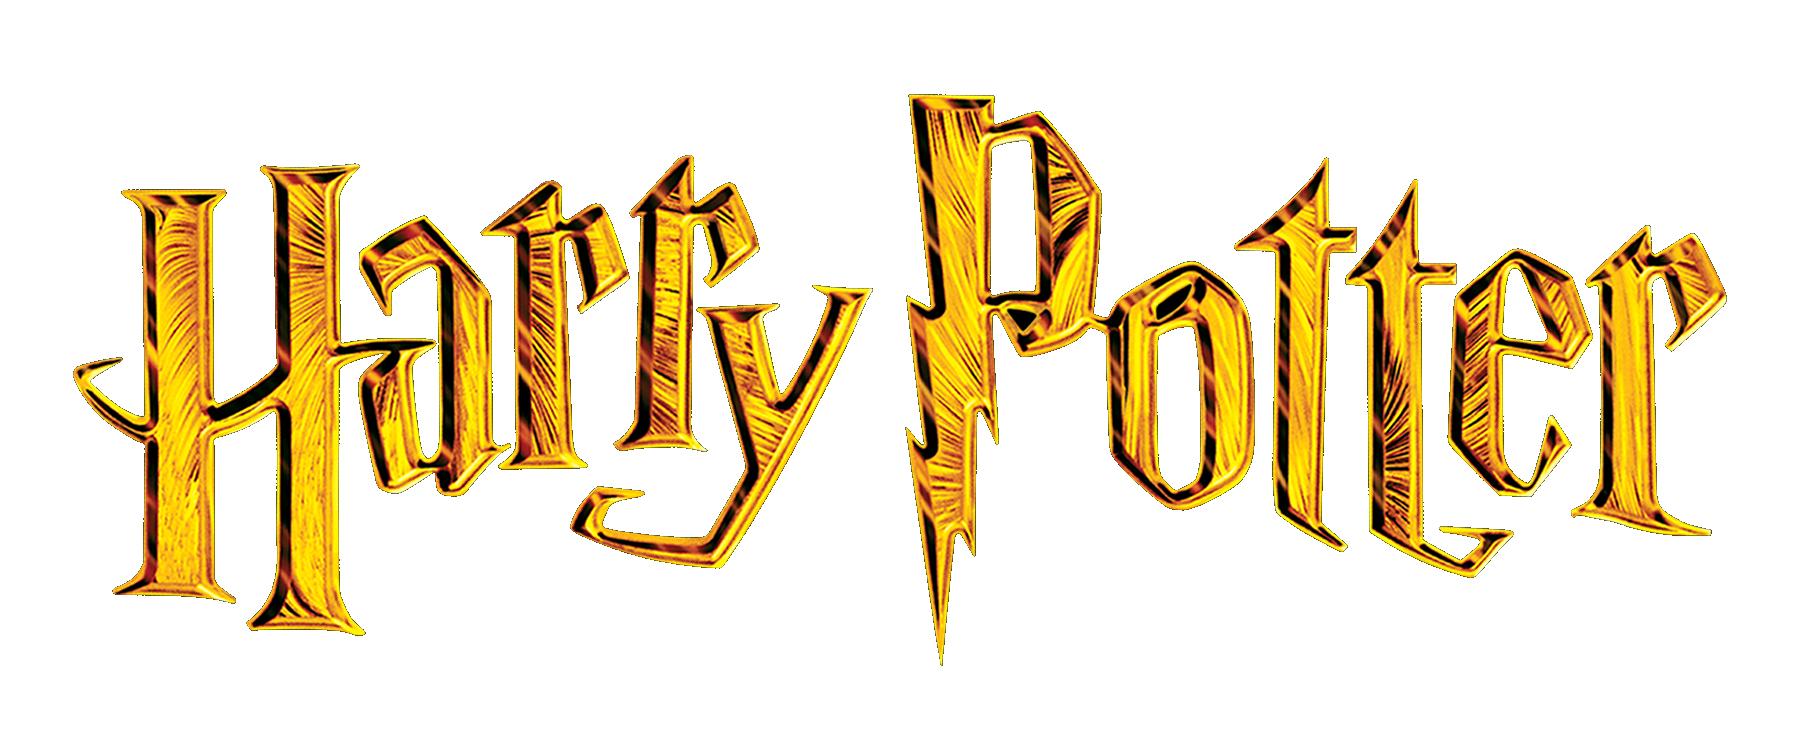 Pin By Josh Irwin On So Stylish Harry Potter Logo Harry Potter Action Figures Harry Potter More